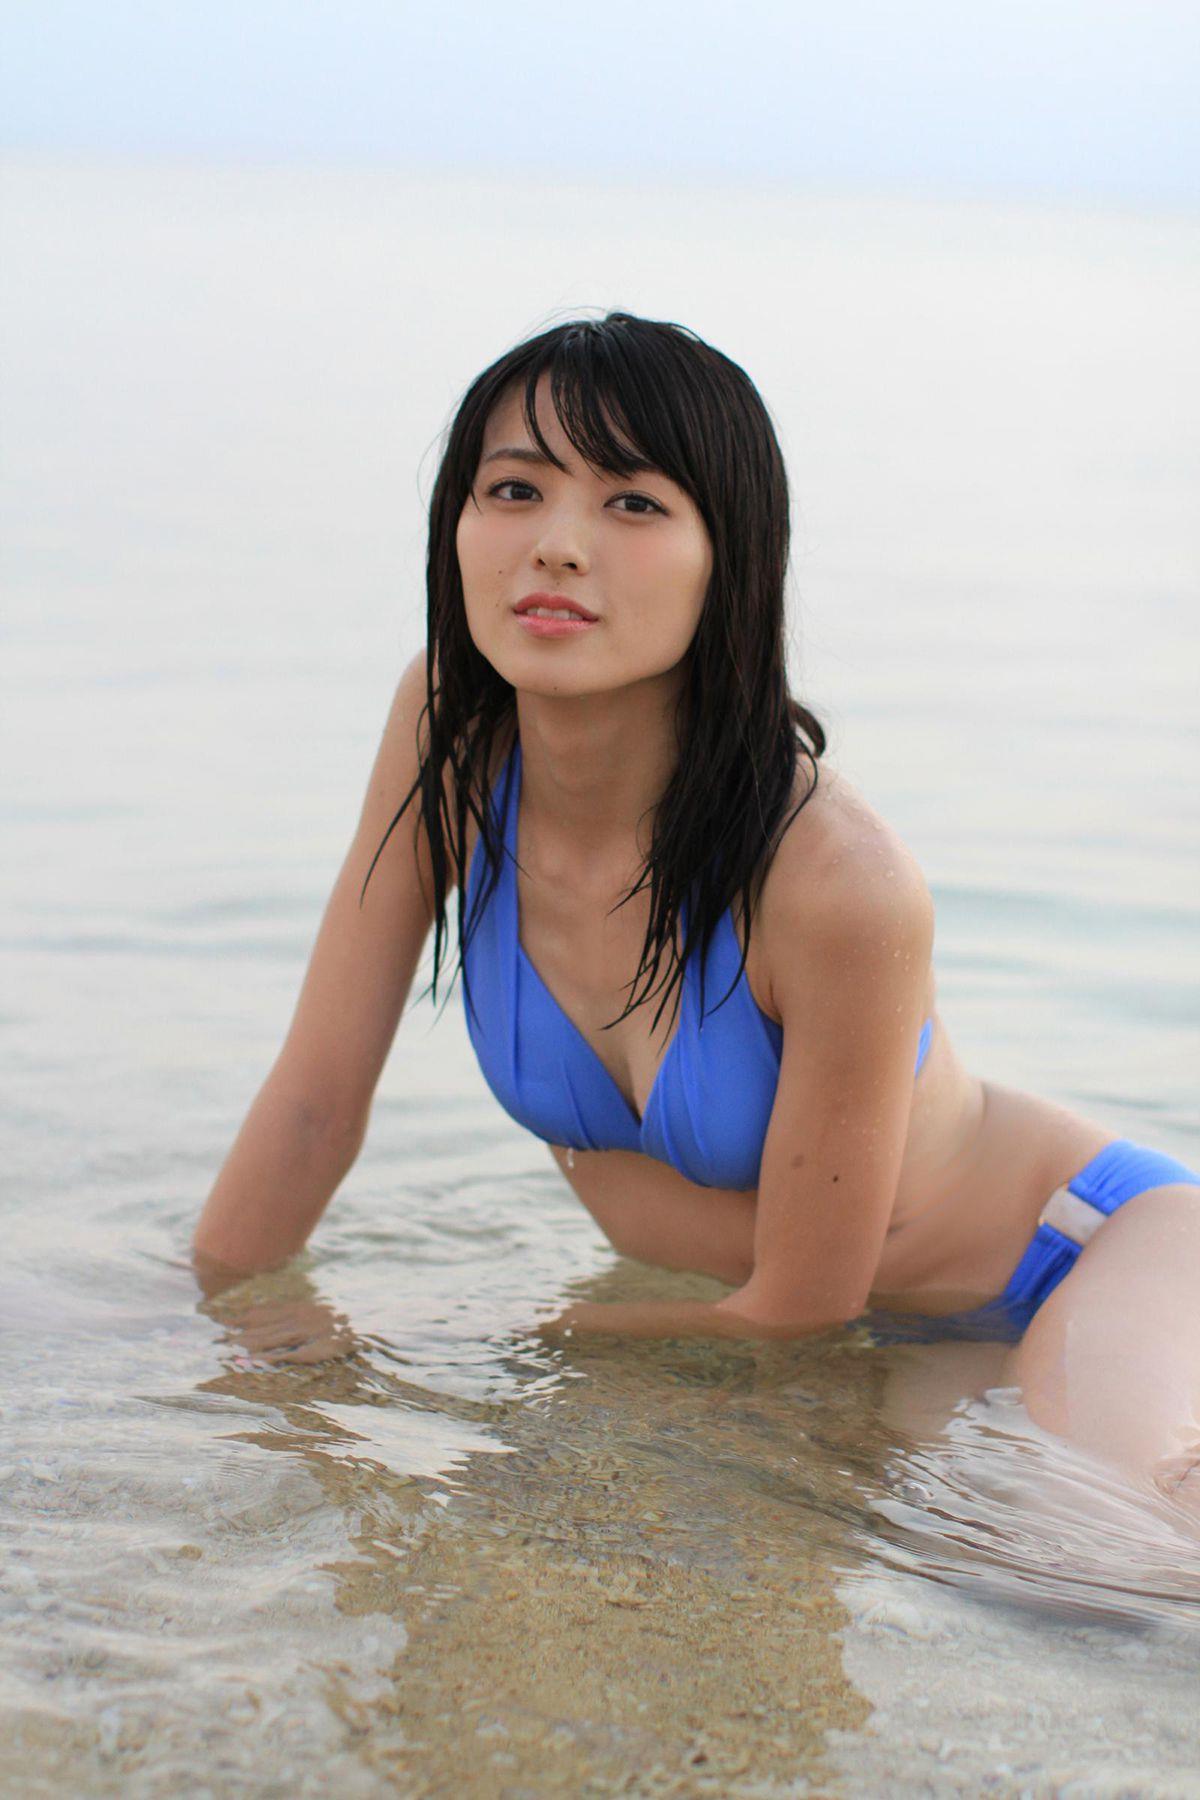 矢島舞美 エロ画像 89